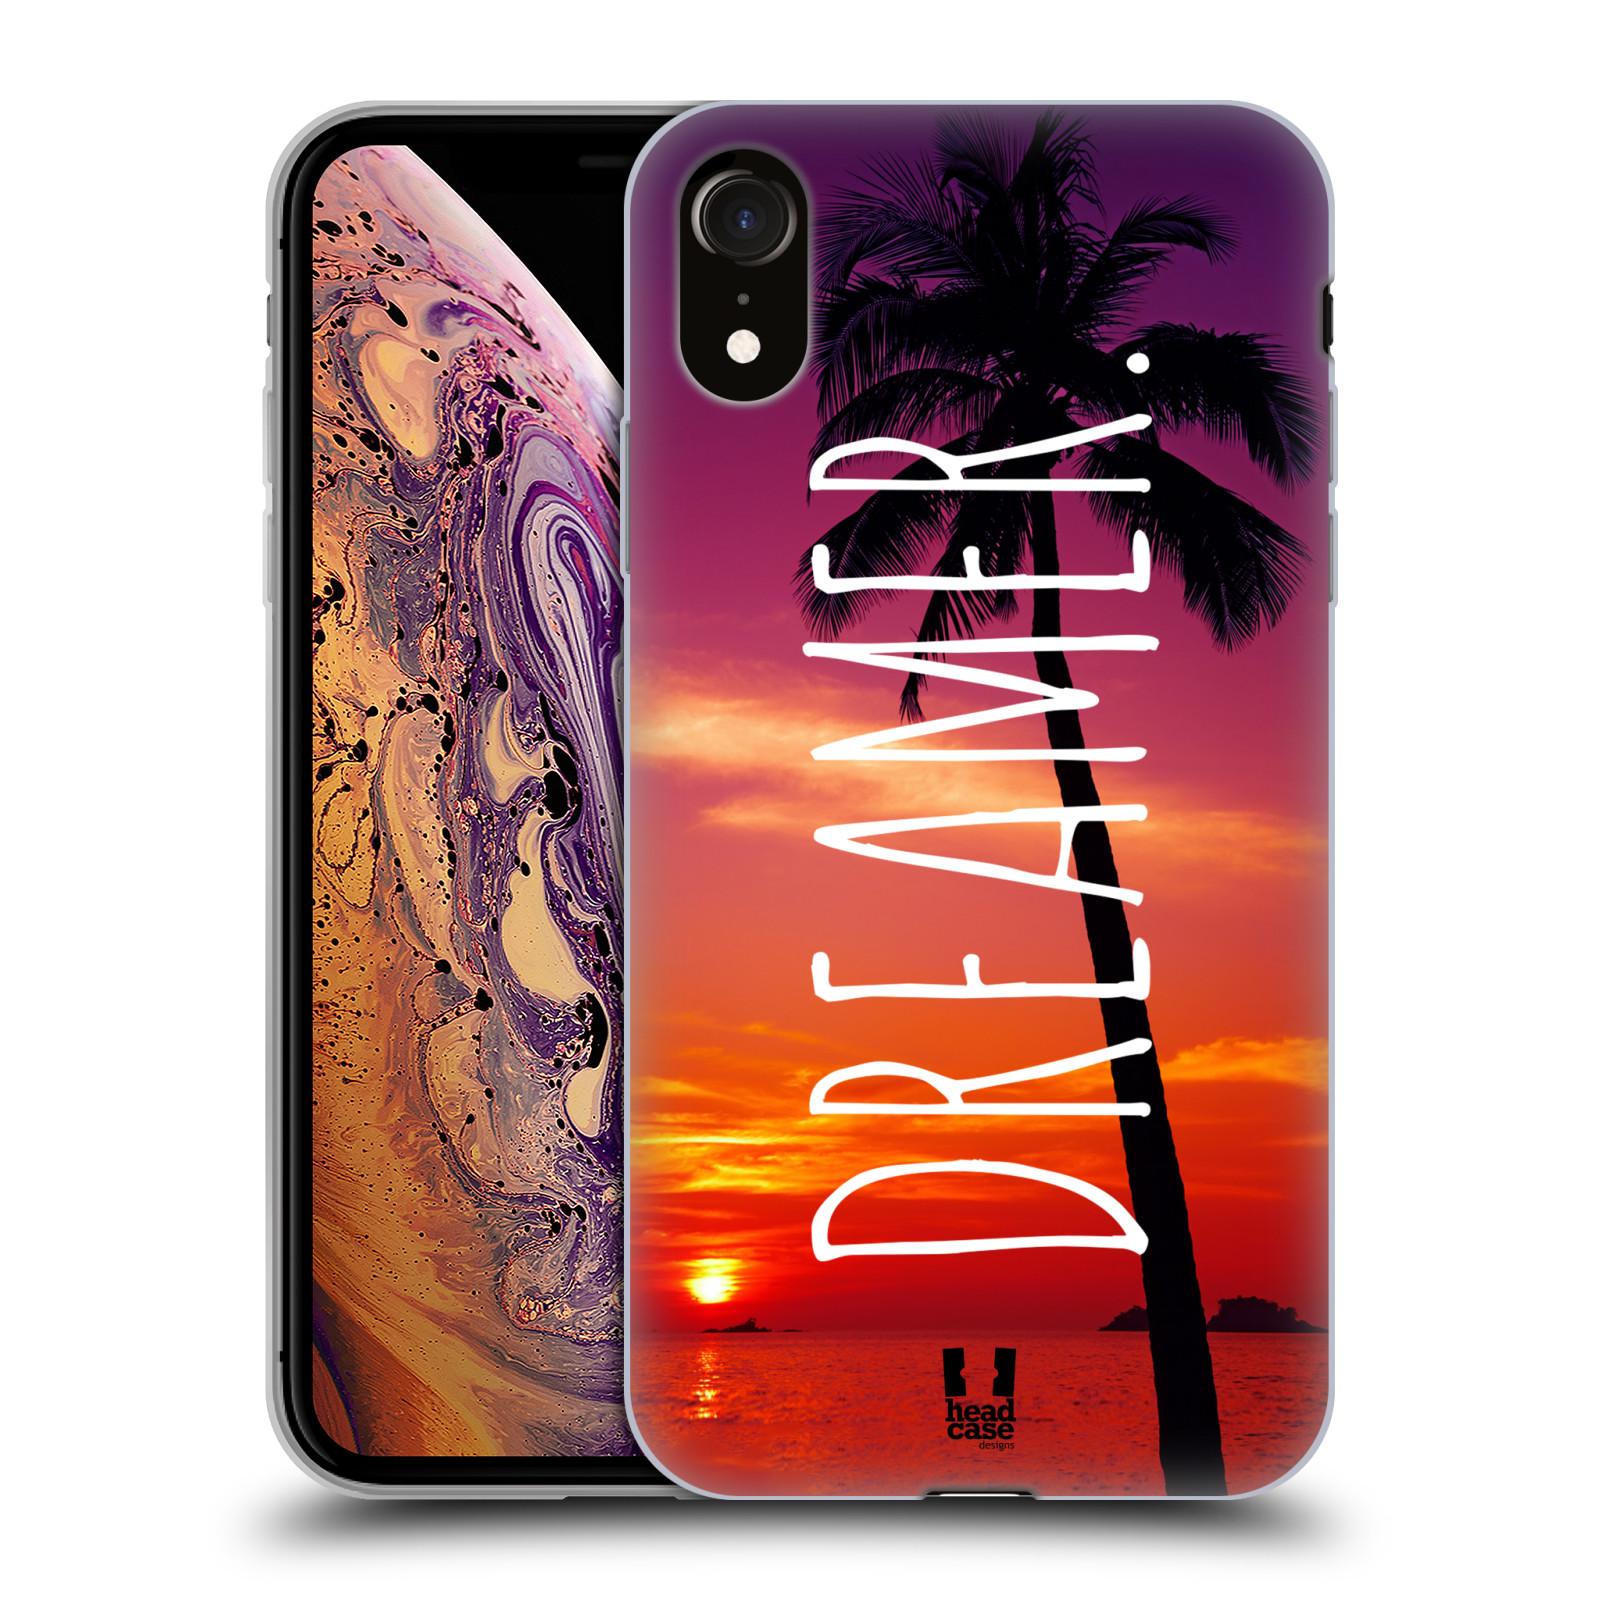 Silikonové pouzdro na mobil Apple iPhone XR - Head Case - MIX DREAMER